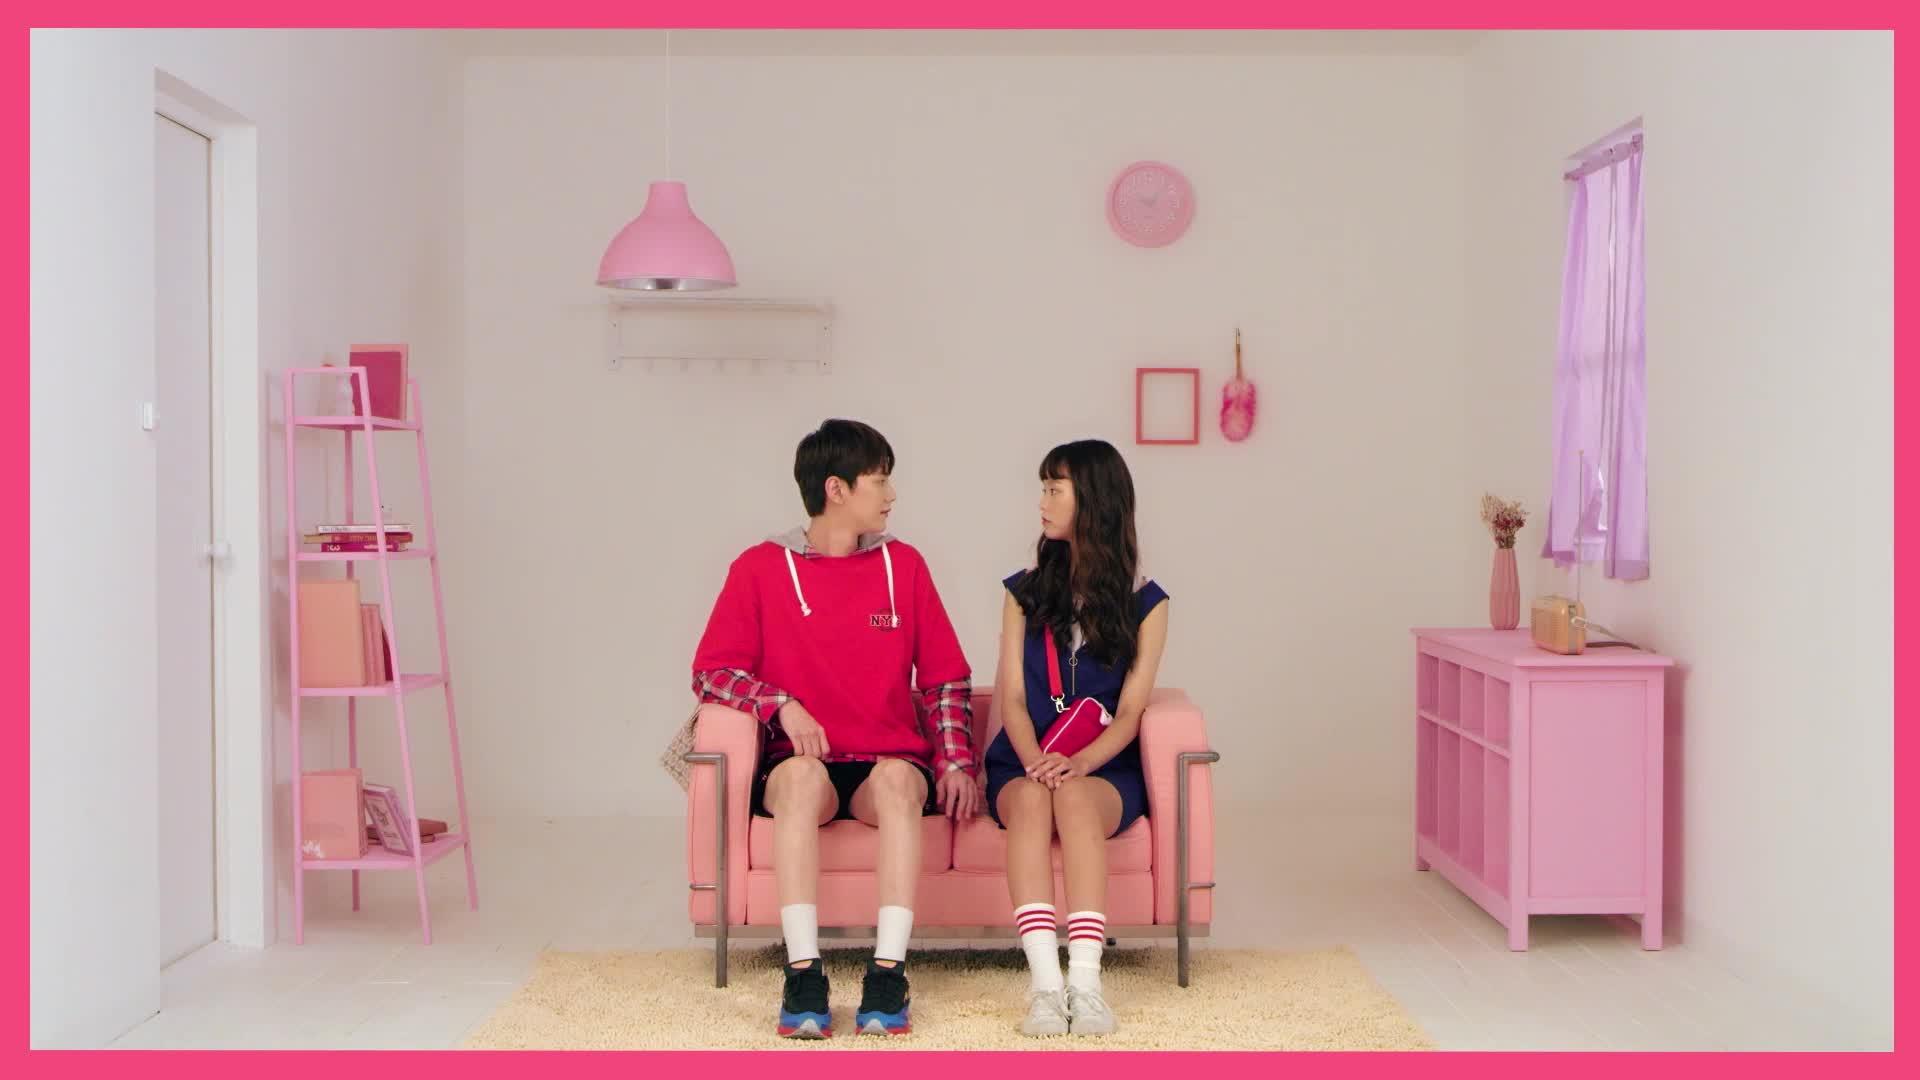 MV_프라이머리(Primary) - Right? (Feat. 소유)